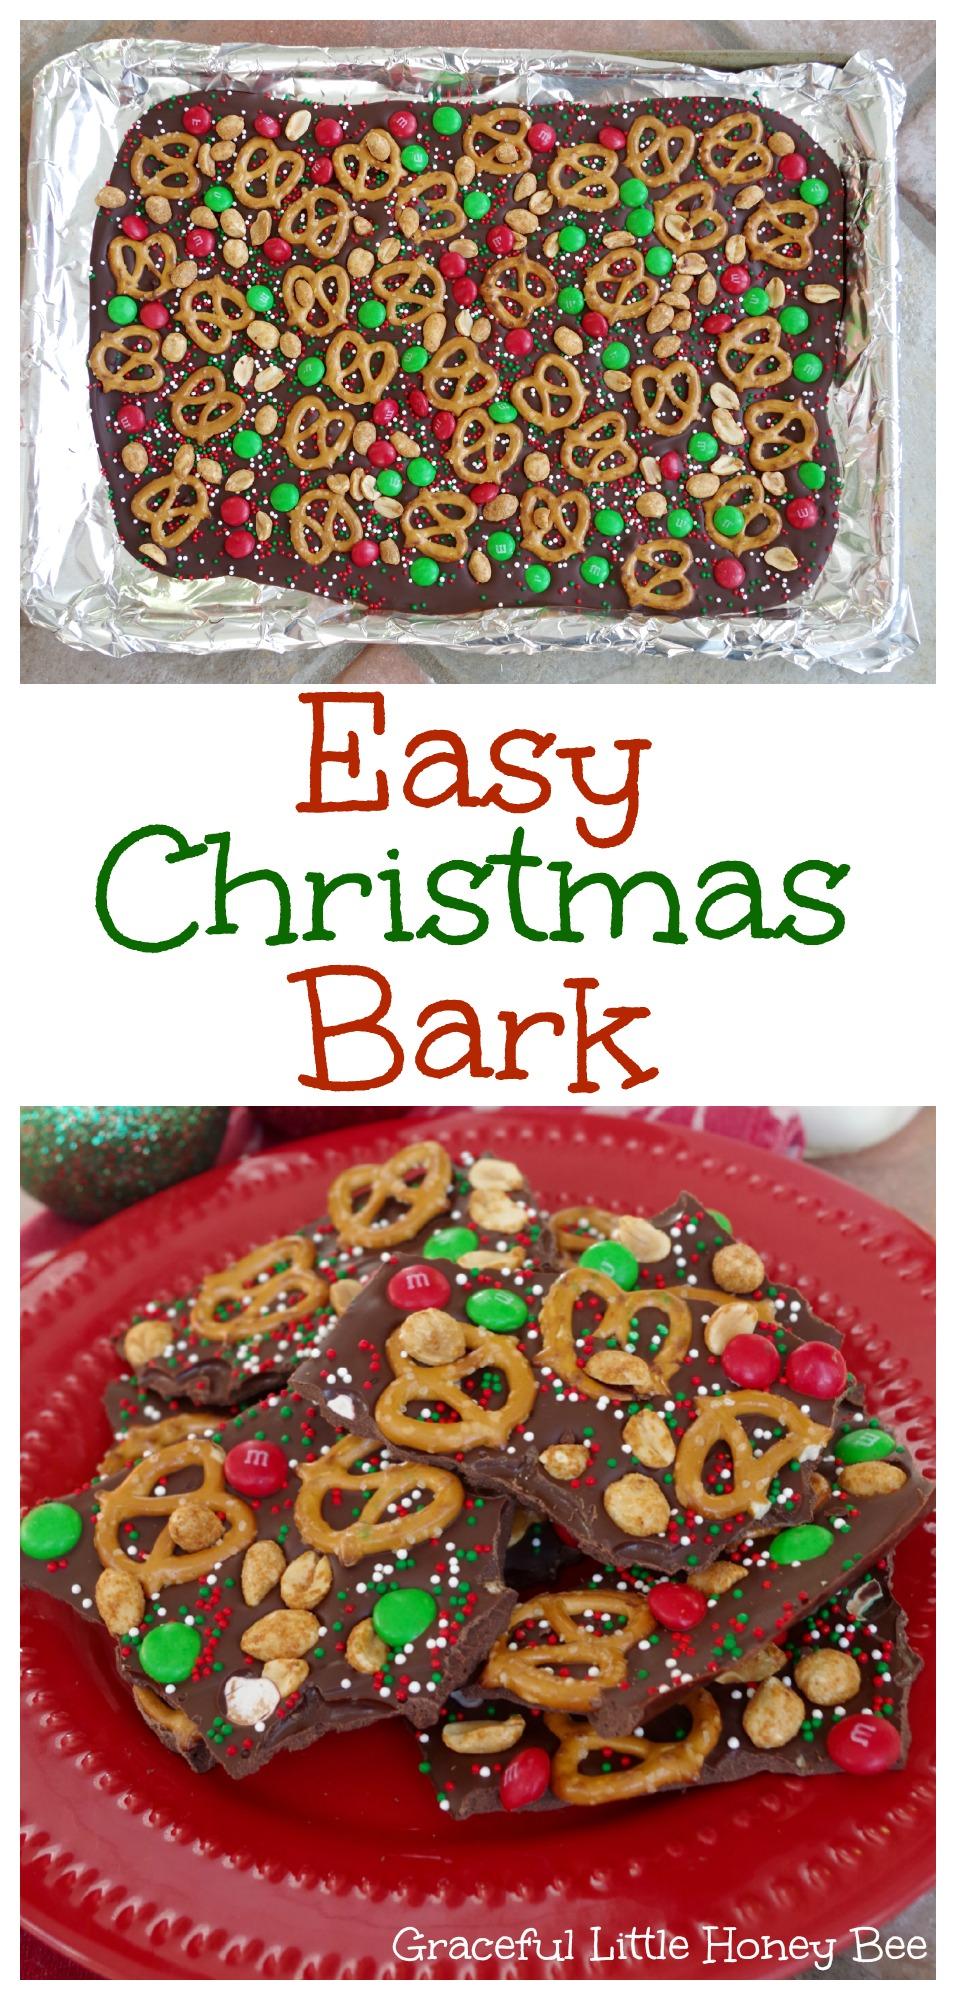 Easy Christmas Bark - Graceful Little Honey Bee